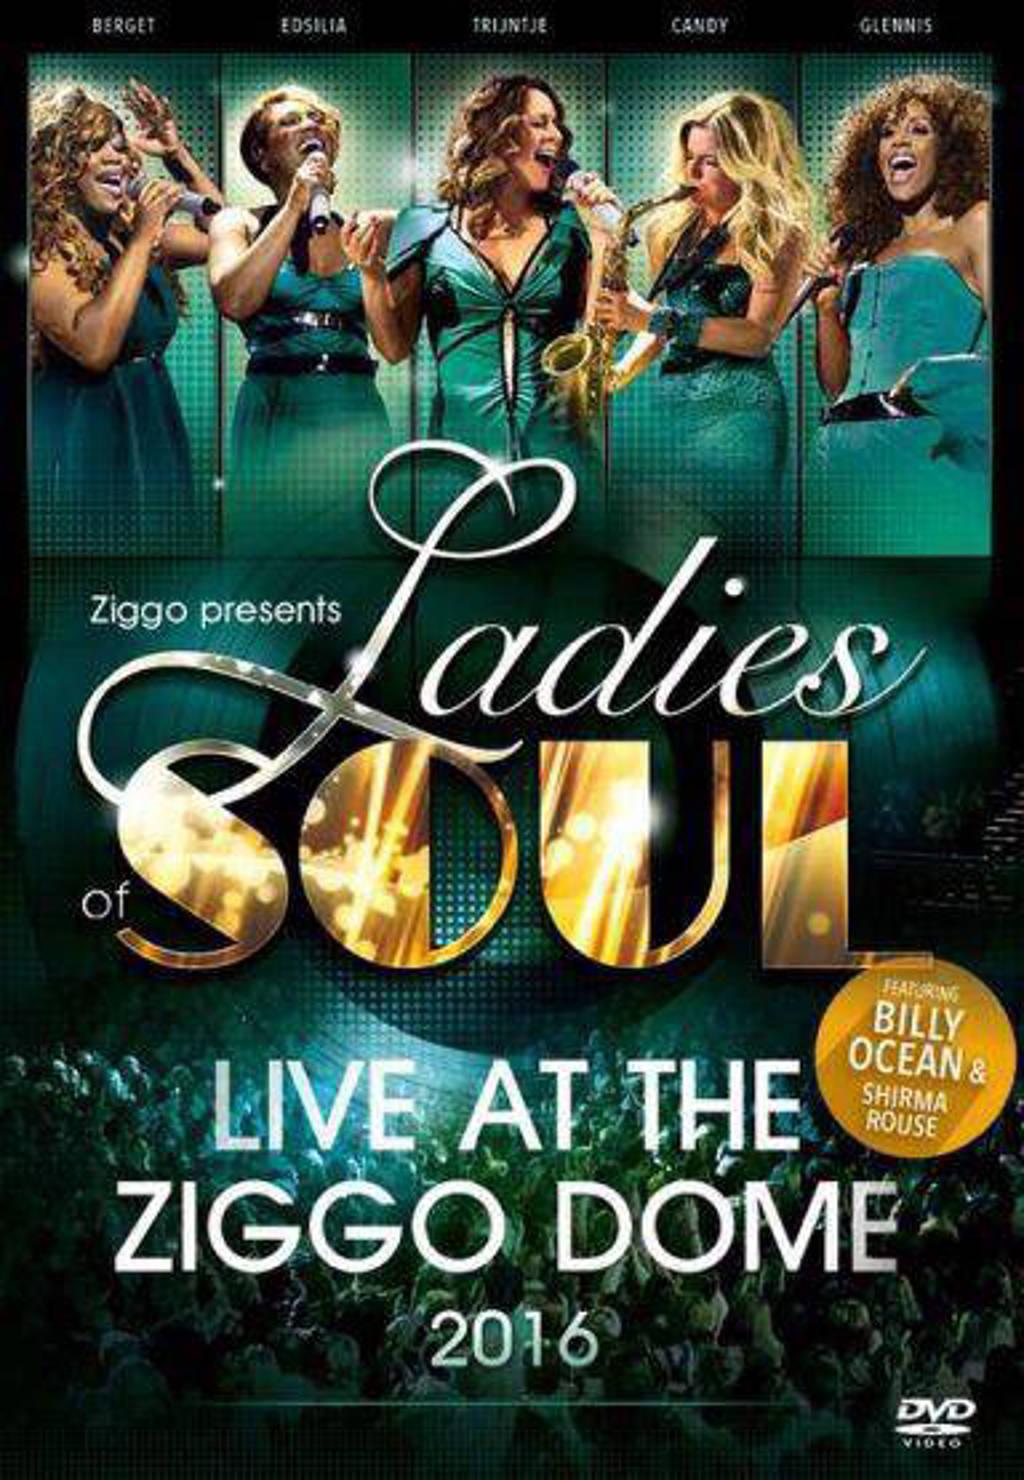 Ladies Of Soul - Live At The Ziggodome 2016 (DVD)